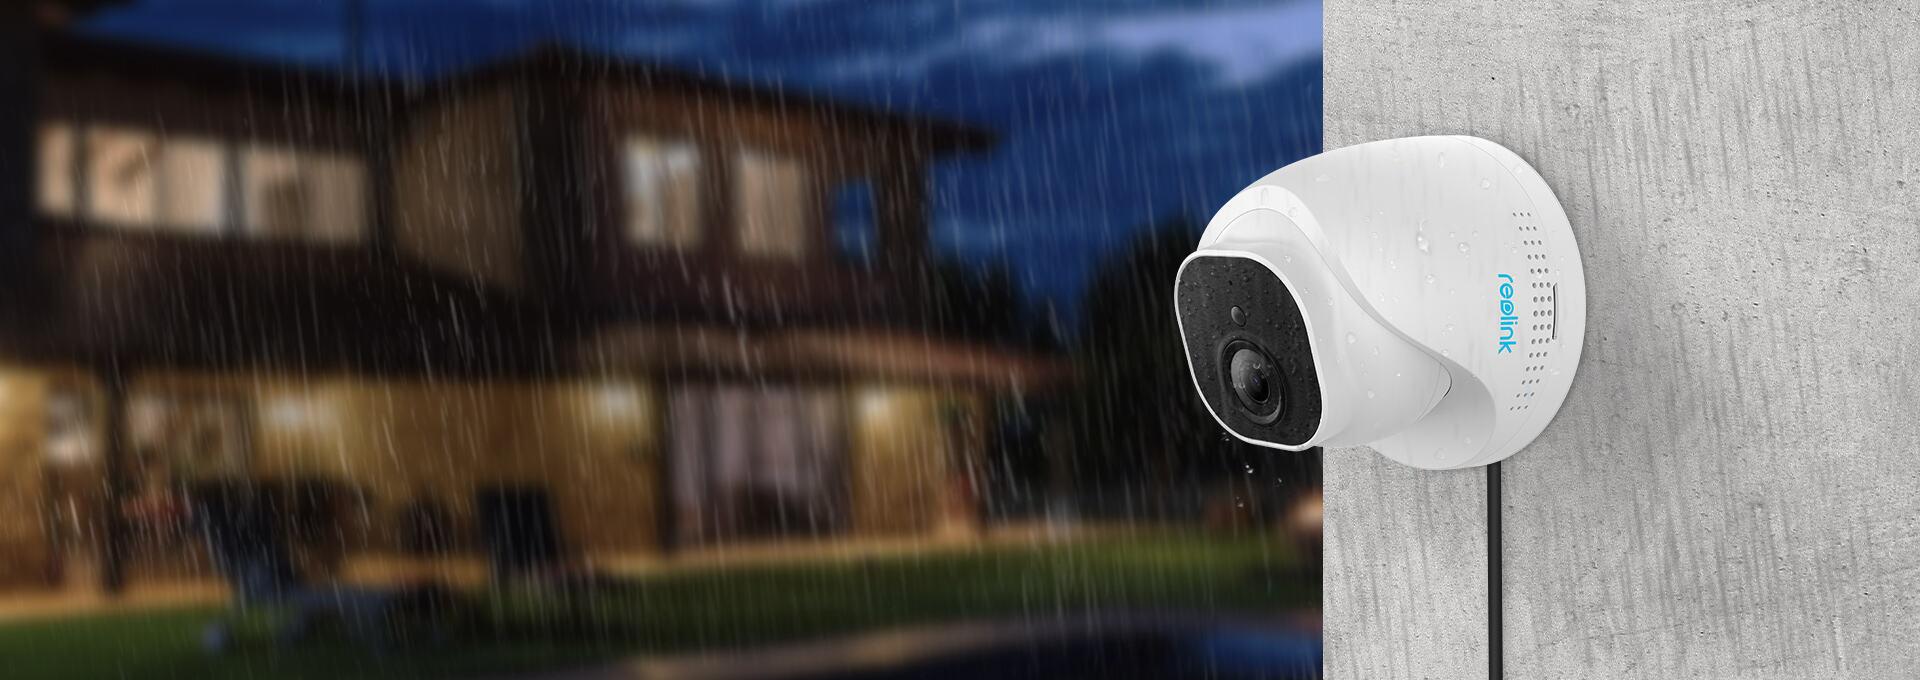 4K 8MP Surveillance Camera